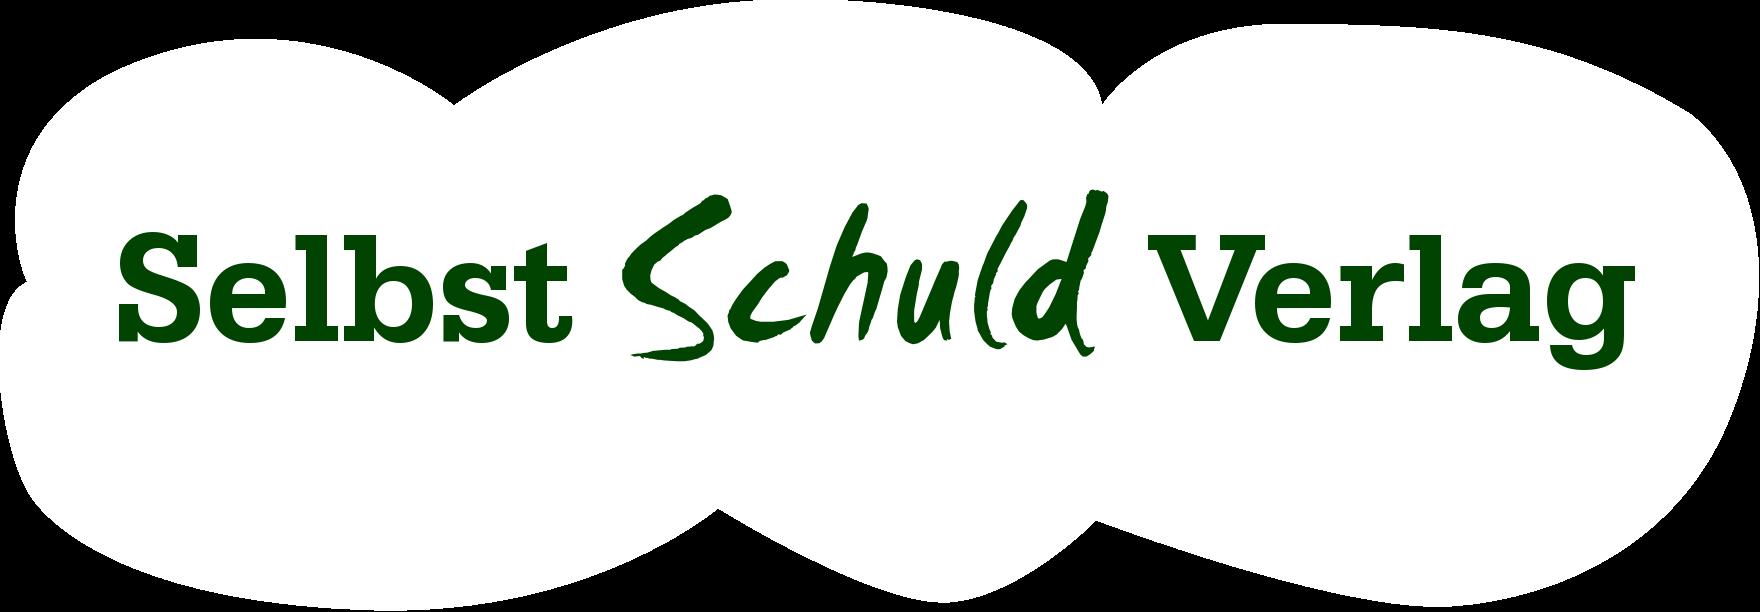 Selbst Schuld Verlag